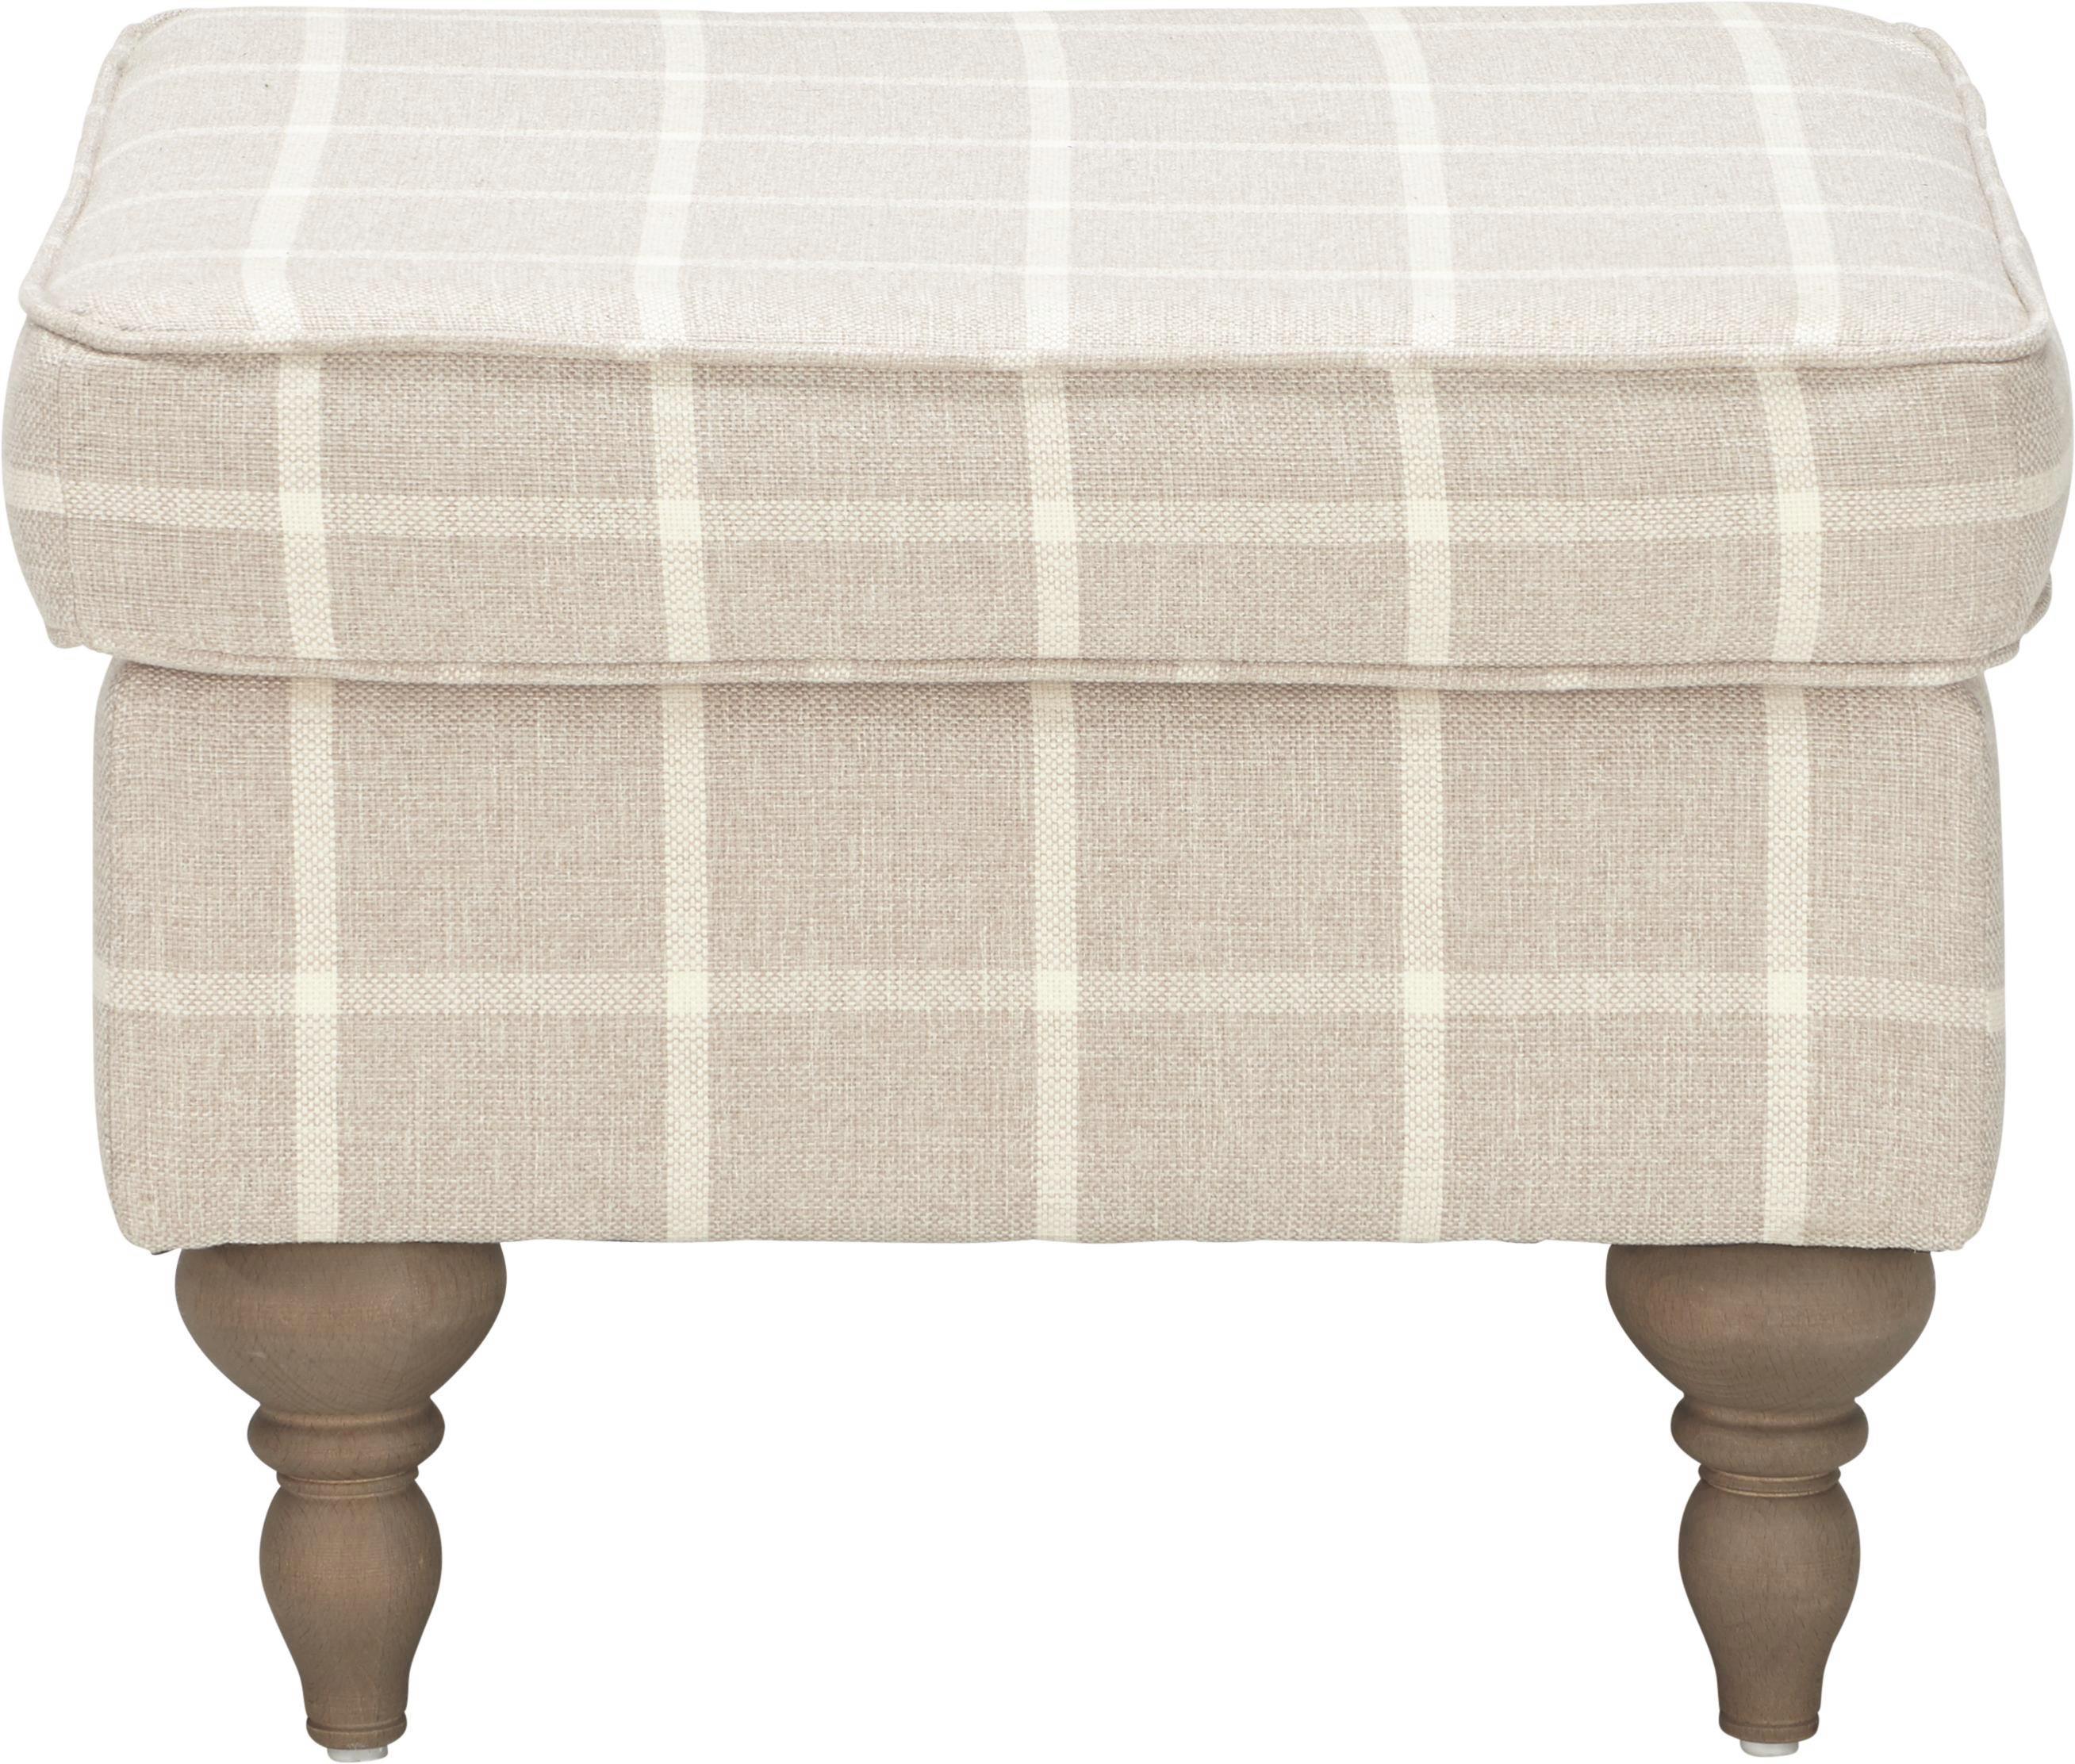 Ülőke Evita - romantikus/Landhaus, textil (55/44/55cm)